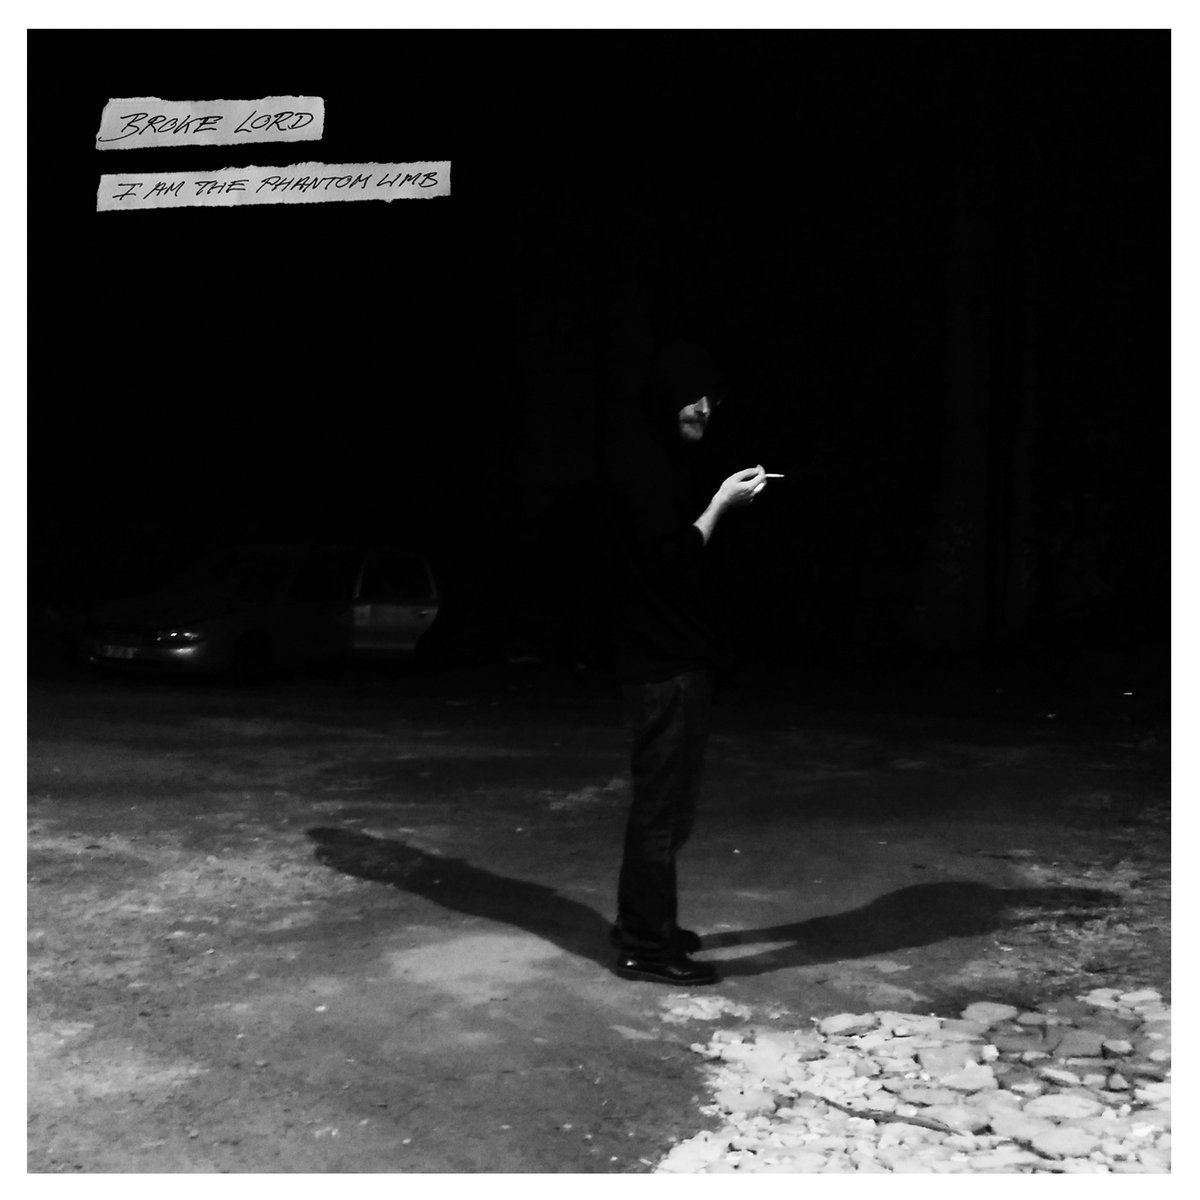 portada del album I Am the Phantom Limb